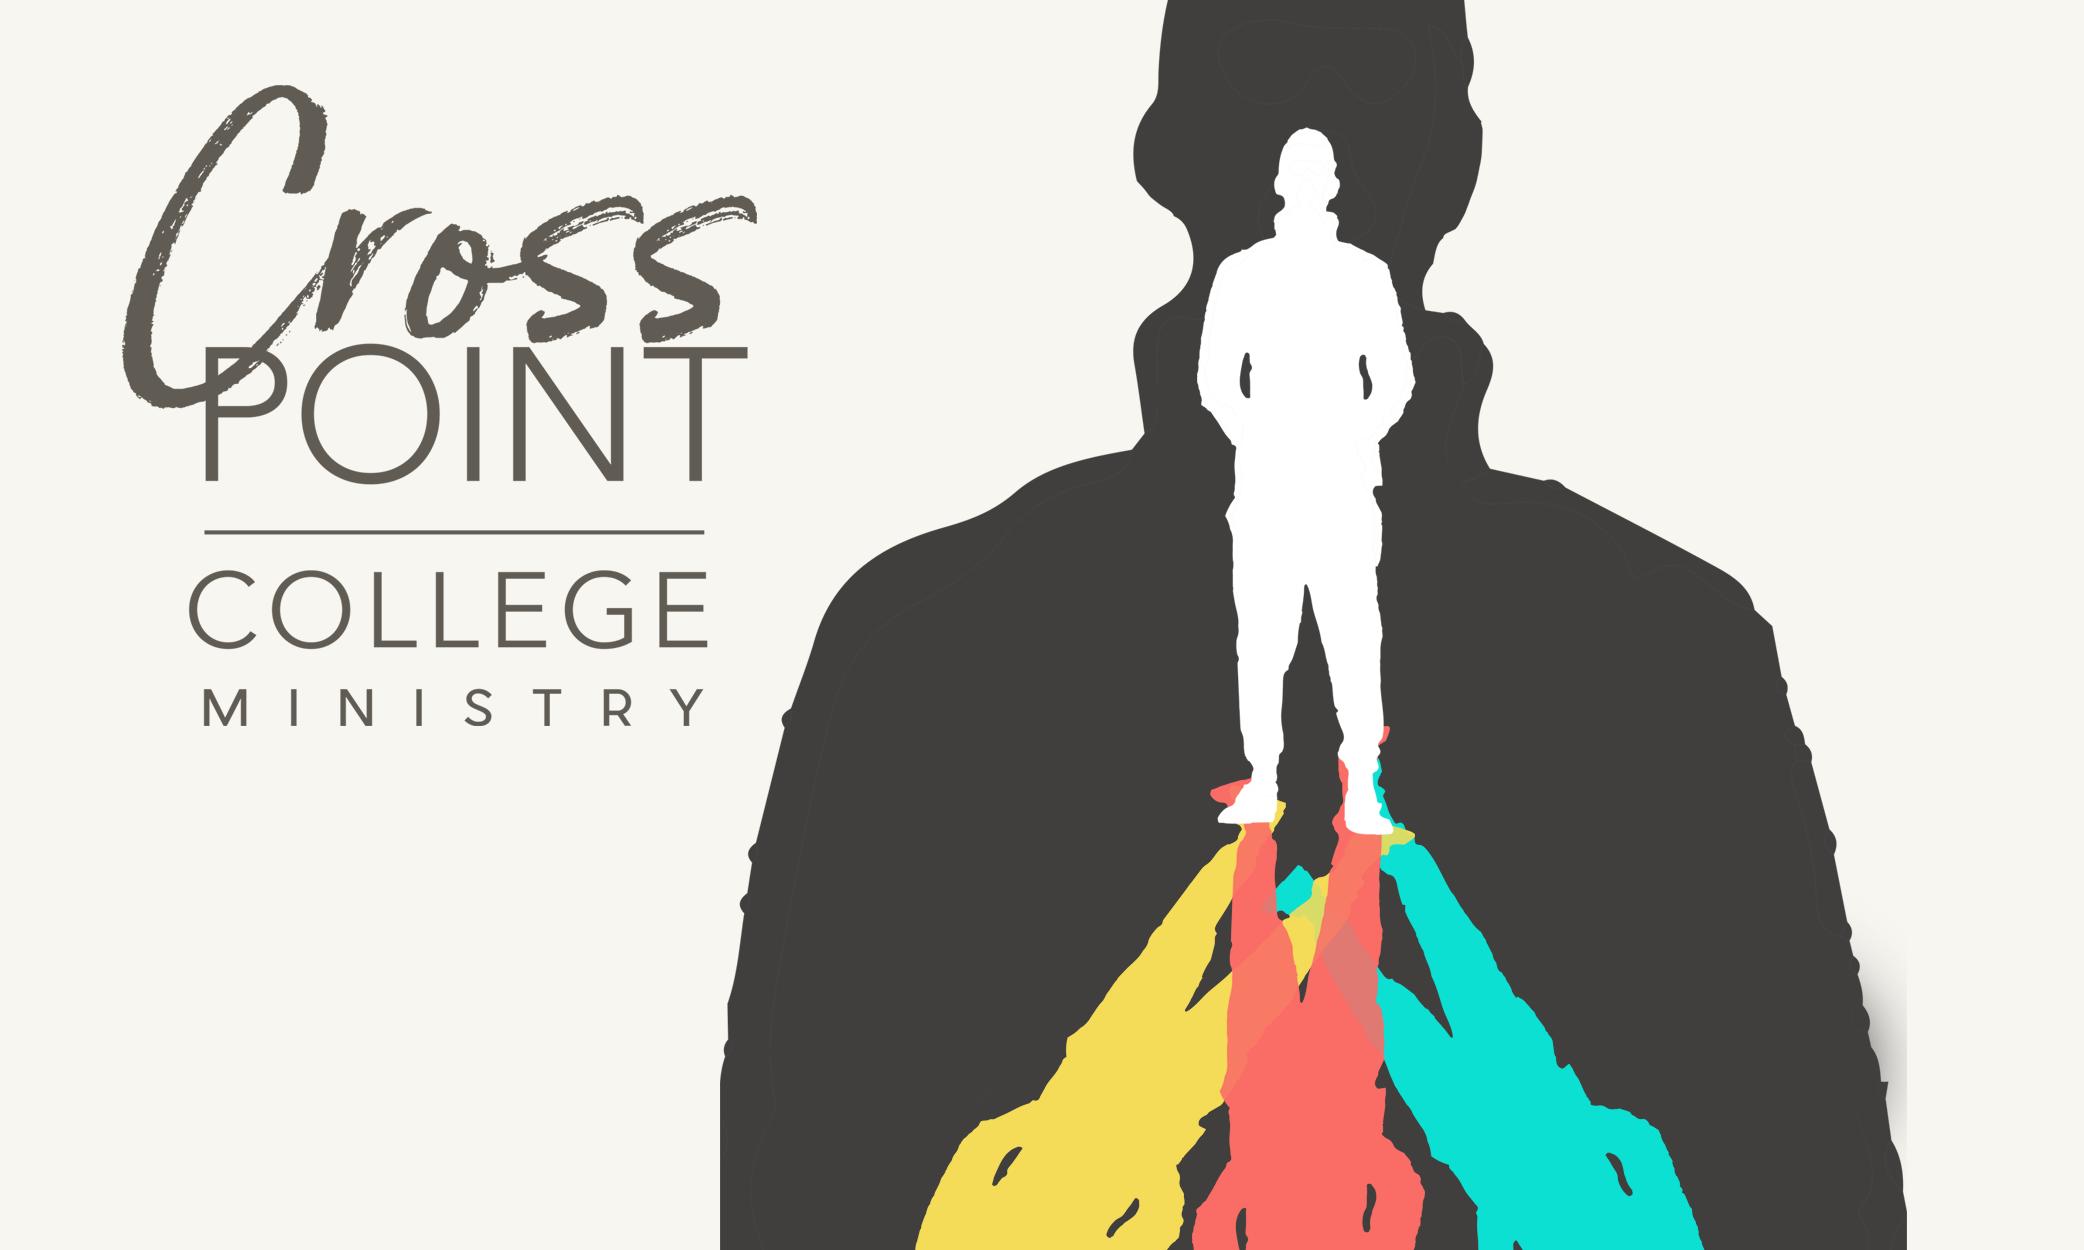 College Ministry - Church biz.png